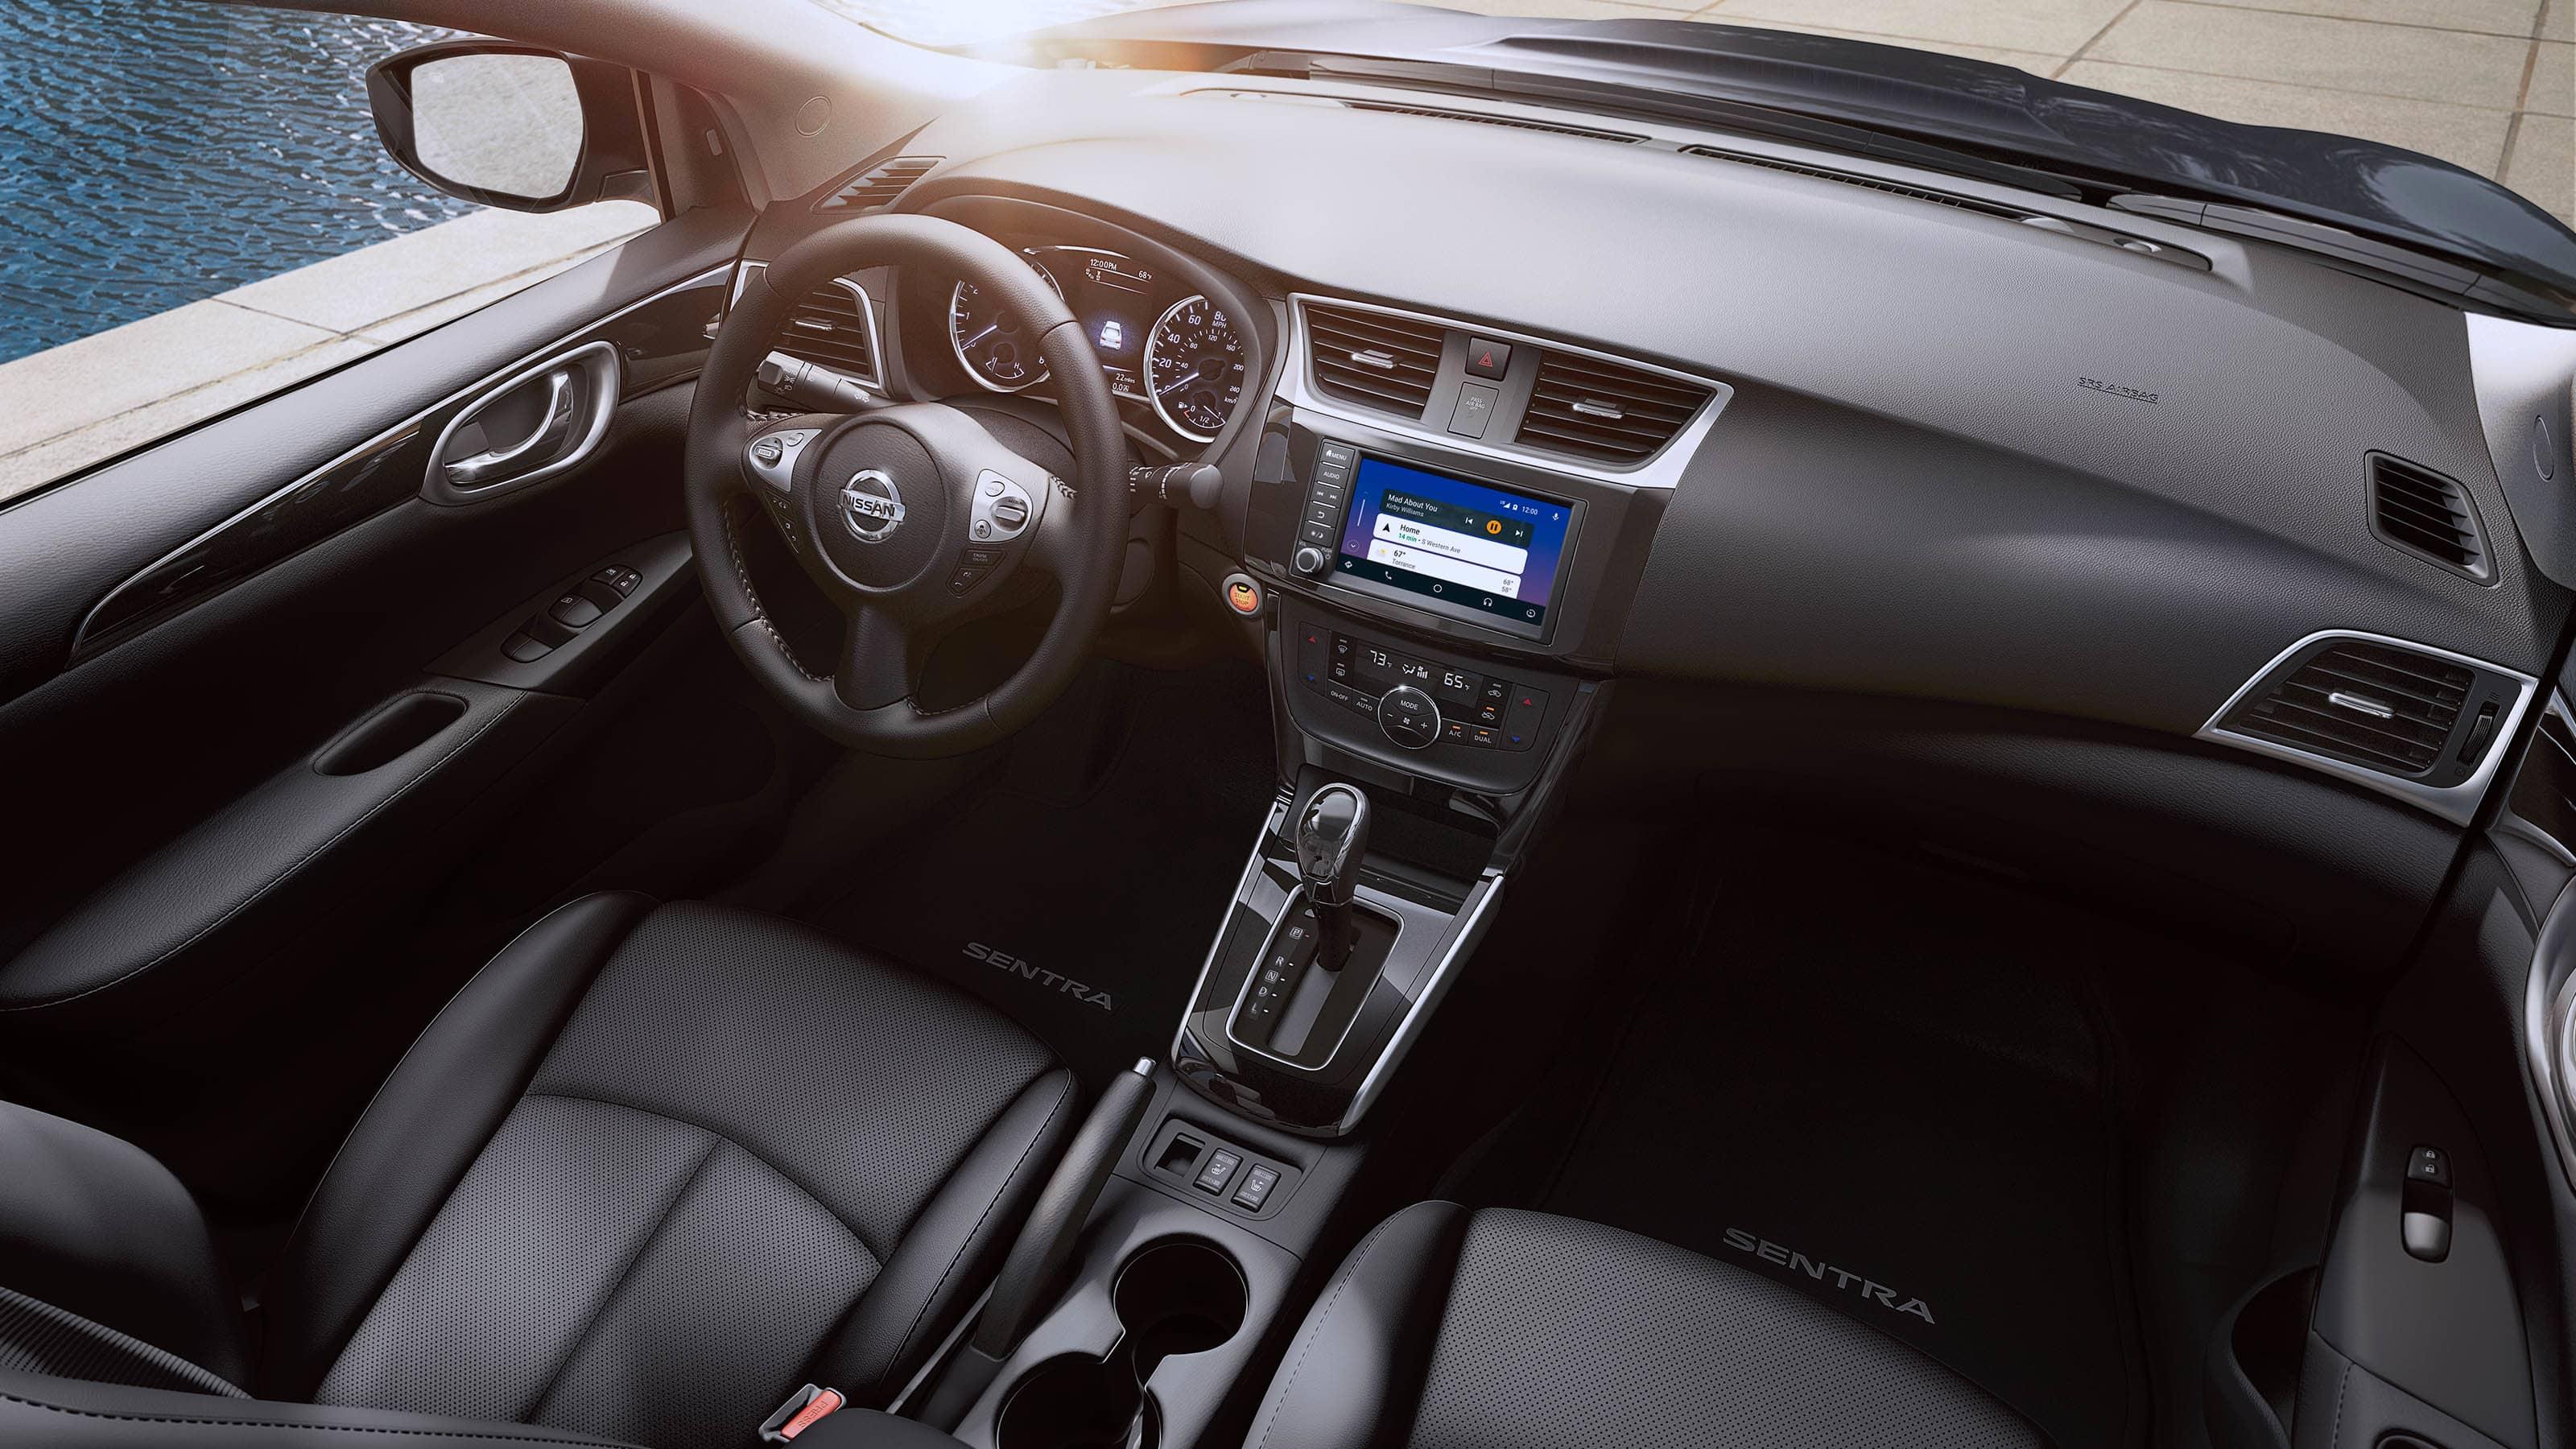 Interior of the 2019 Nissan Sentra